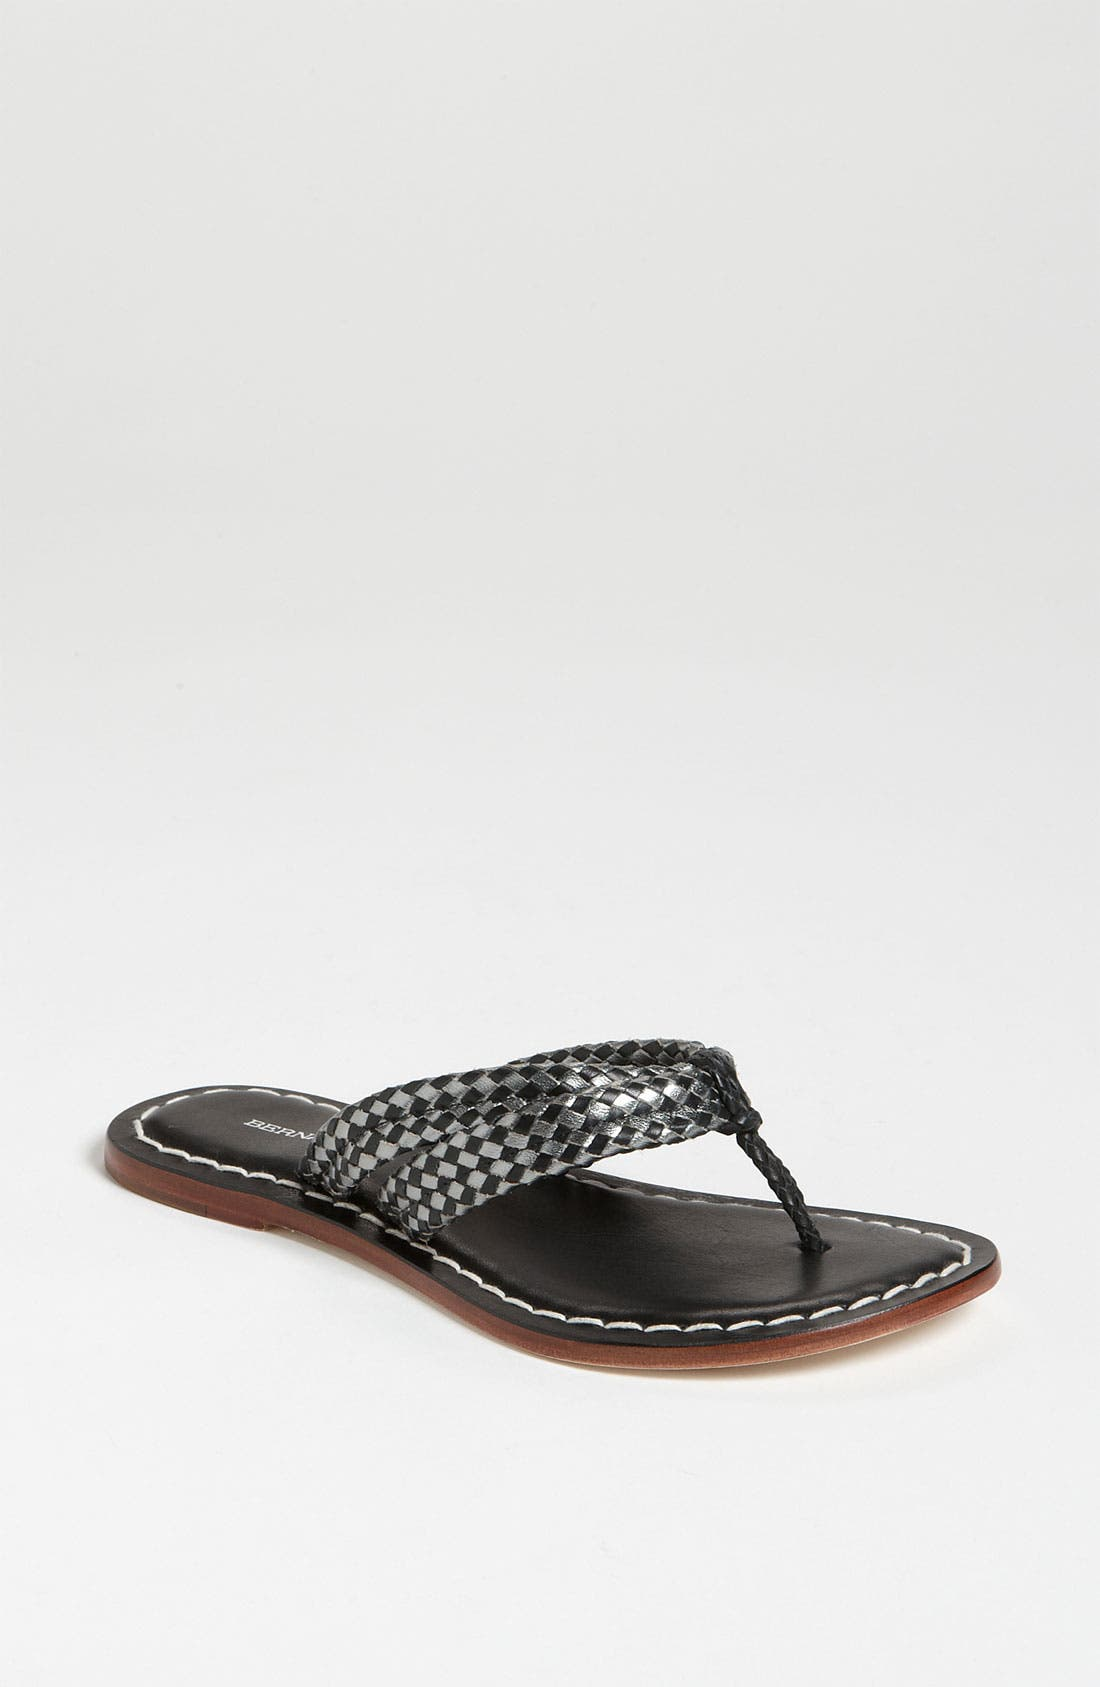 Main Image - Bernardo Footwear Miami Sandal